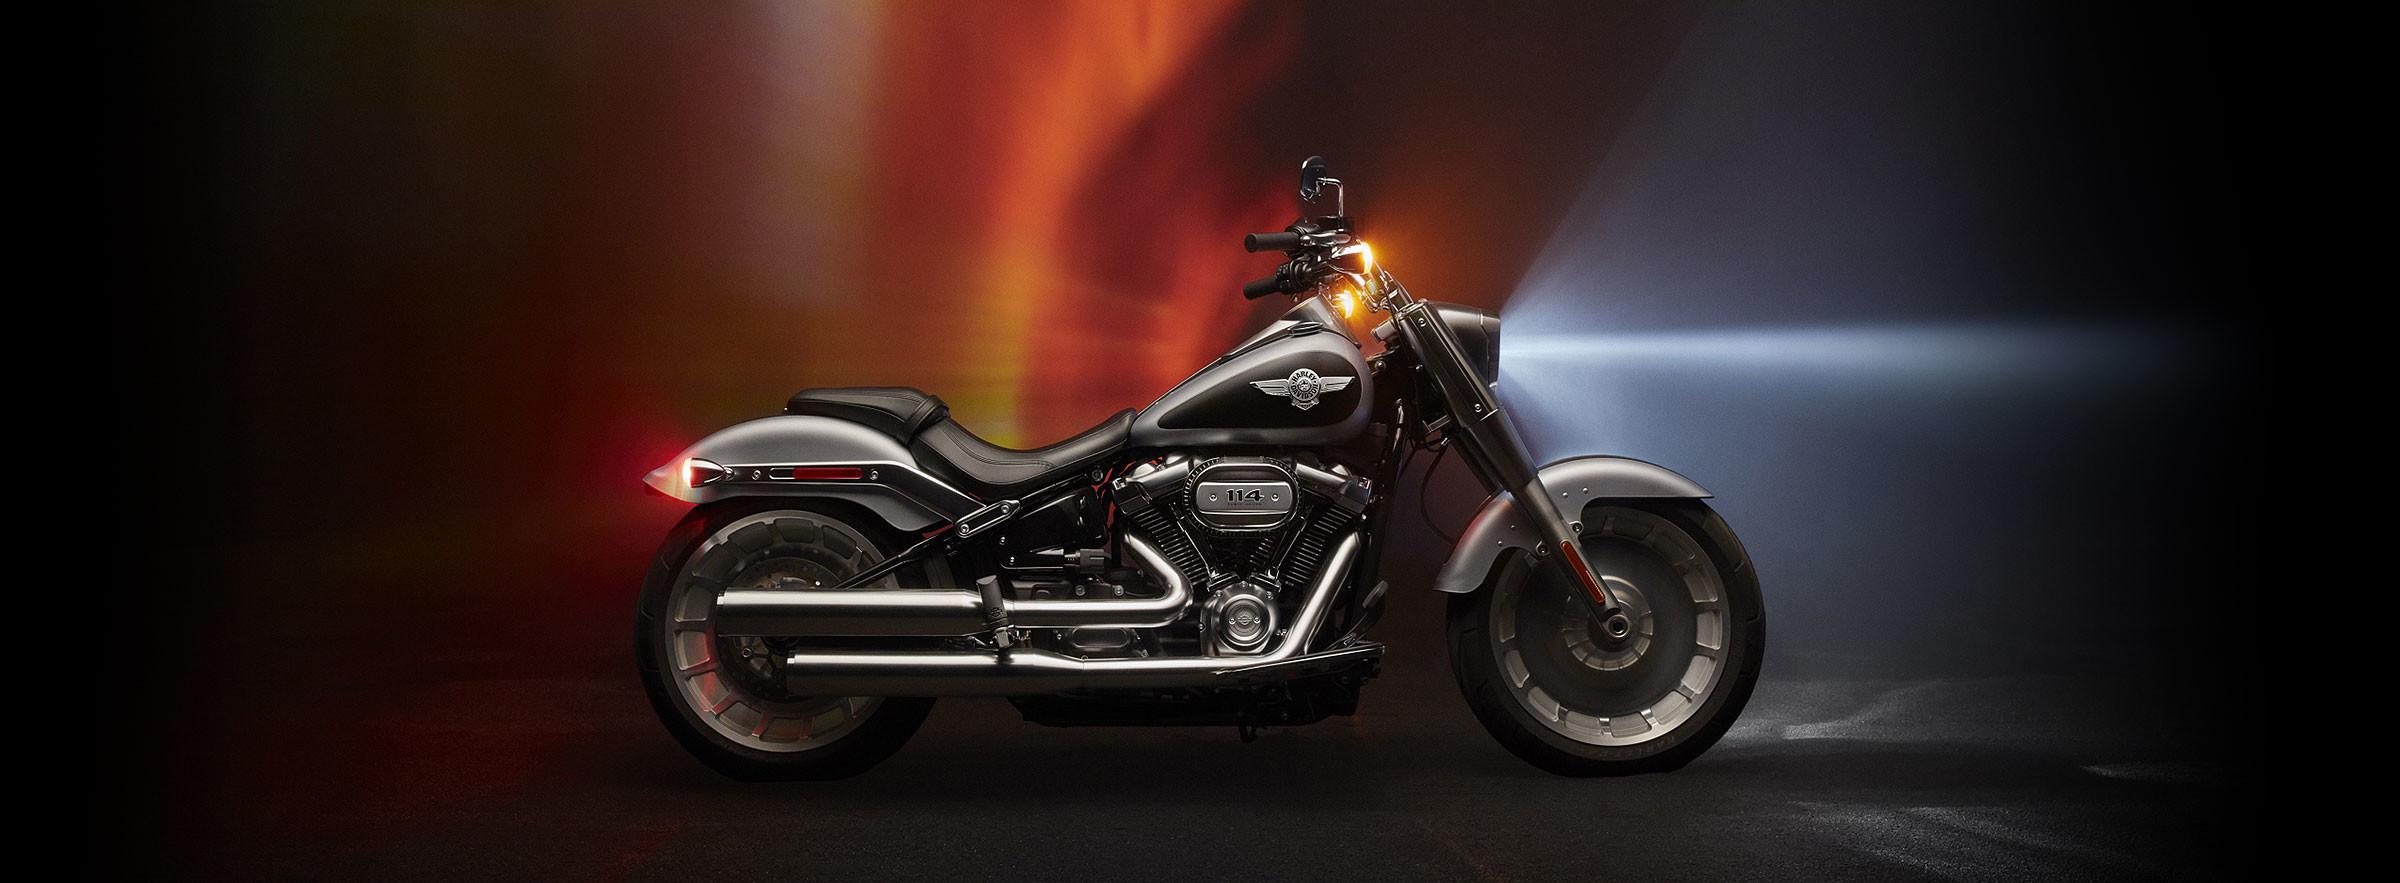 Fat Boy® 114 | Stutsman Harley-Davidson®